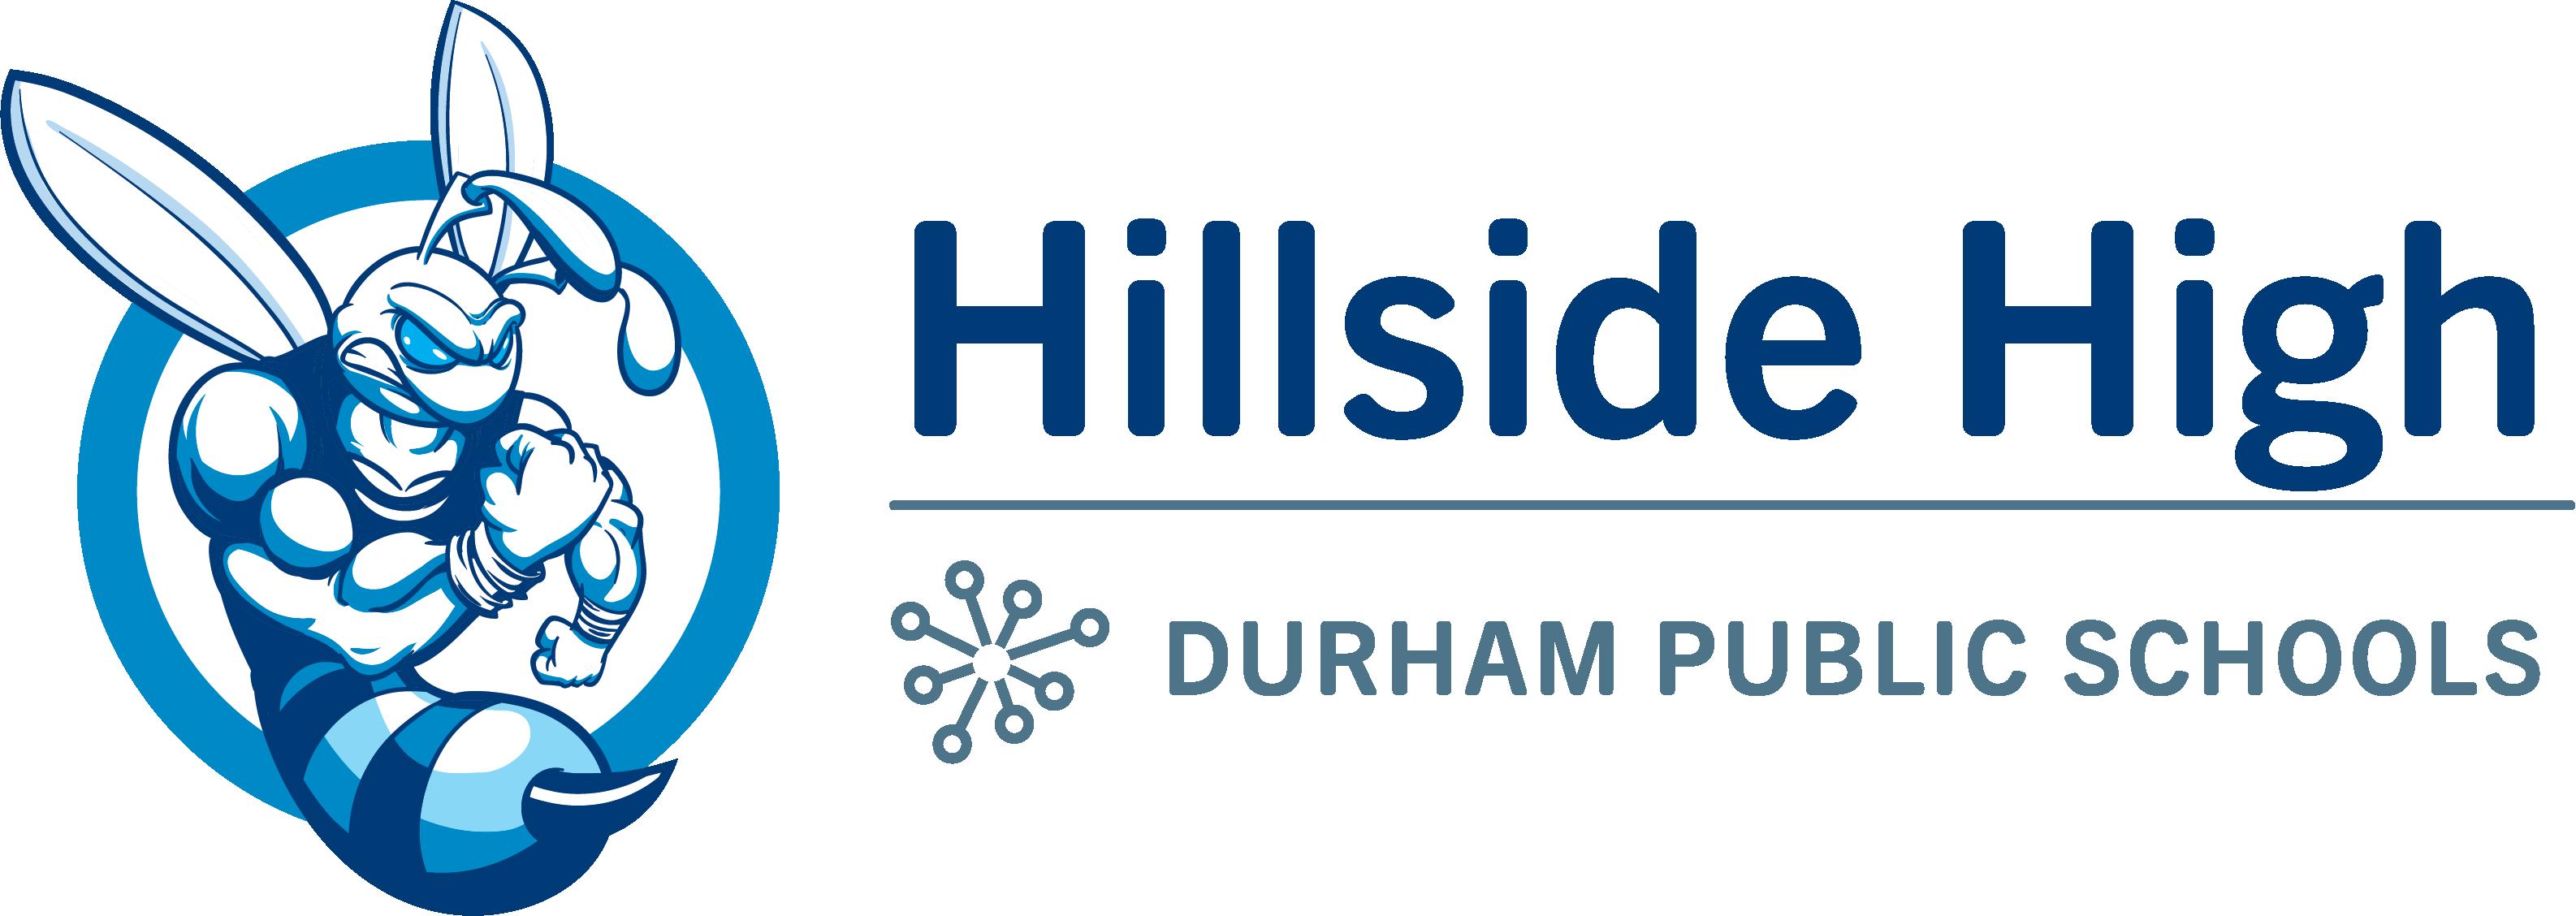 Hillside High School Homepage